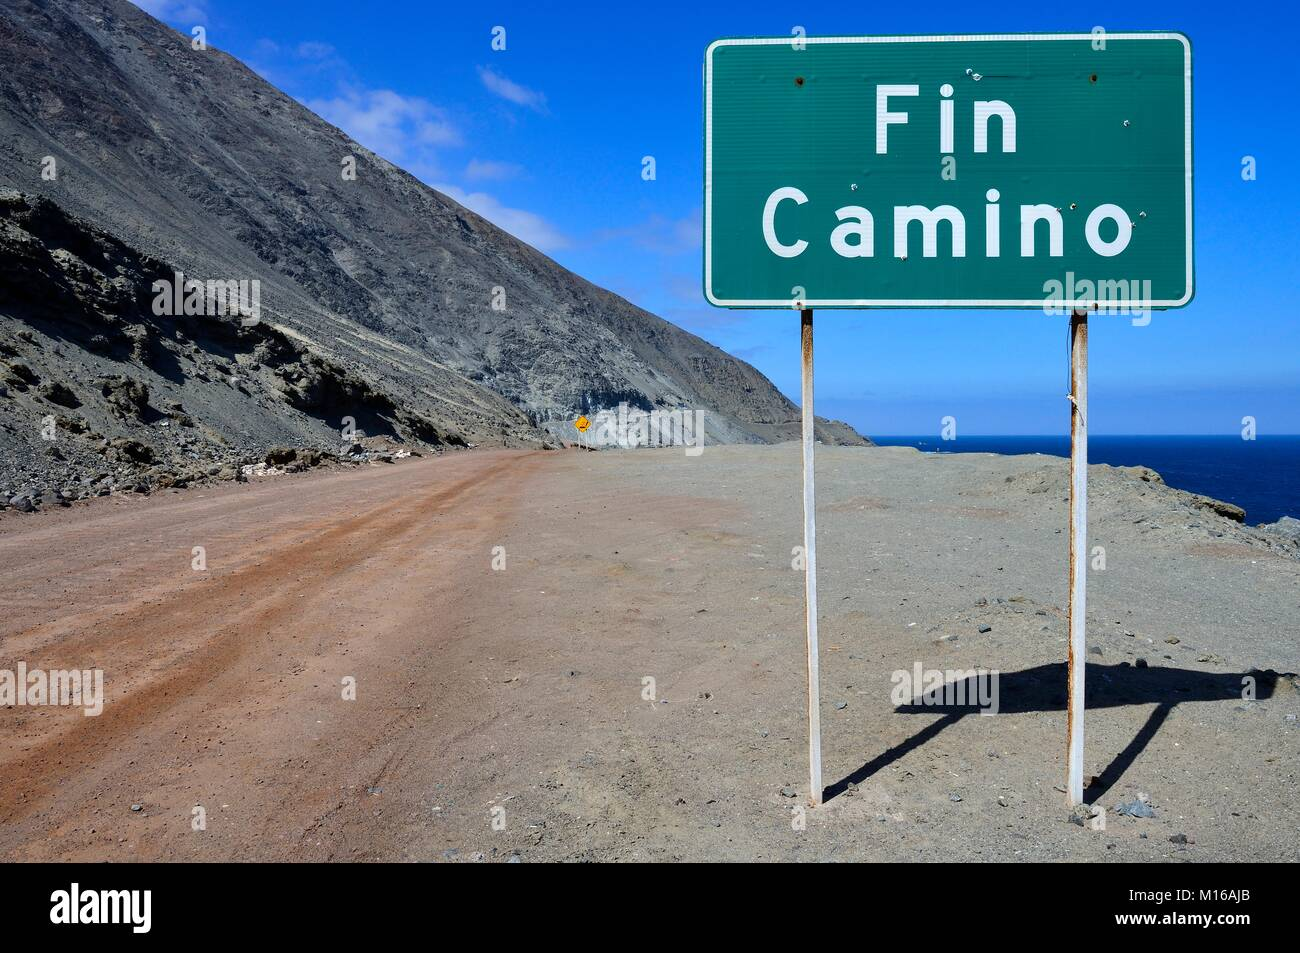 Warning sign at the end of the road on the rocky coast, near Antofagasta, Región de Antofagasta, Chile - Stock Image